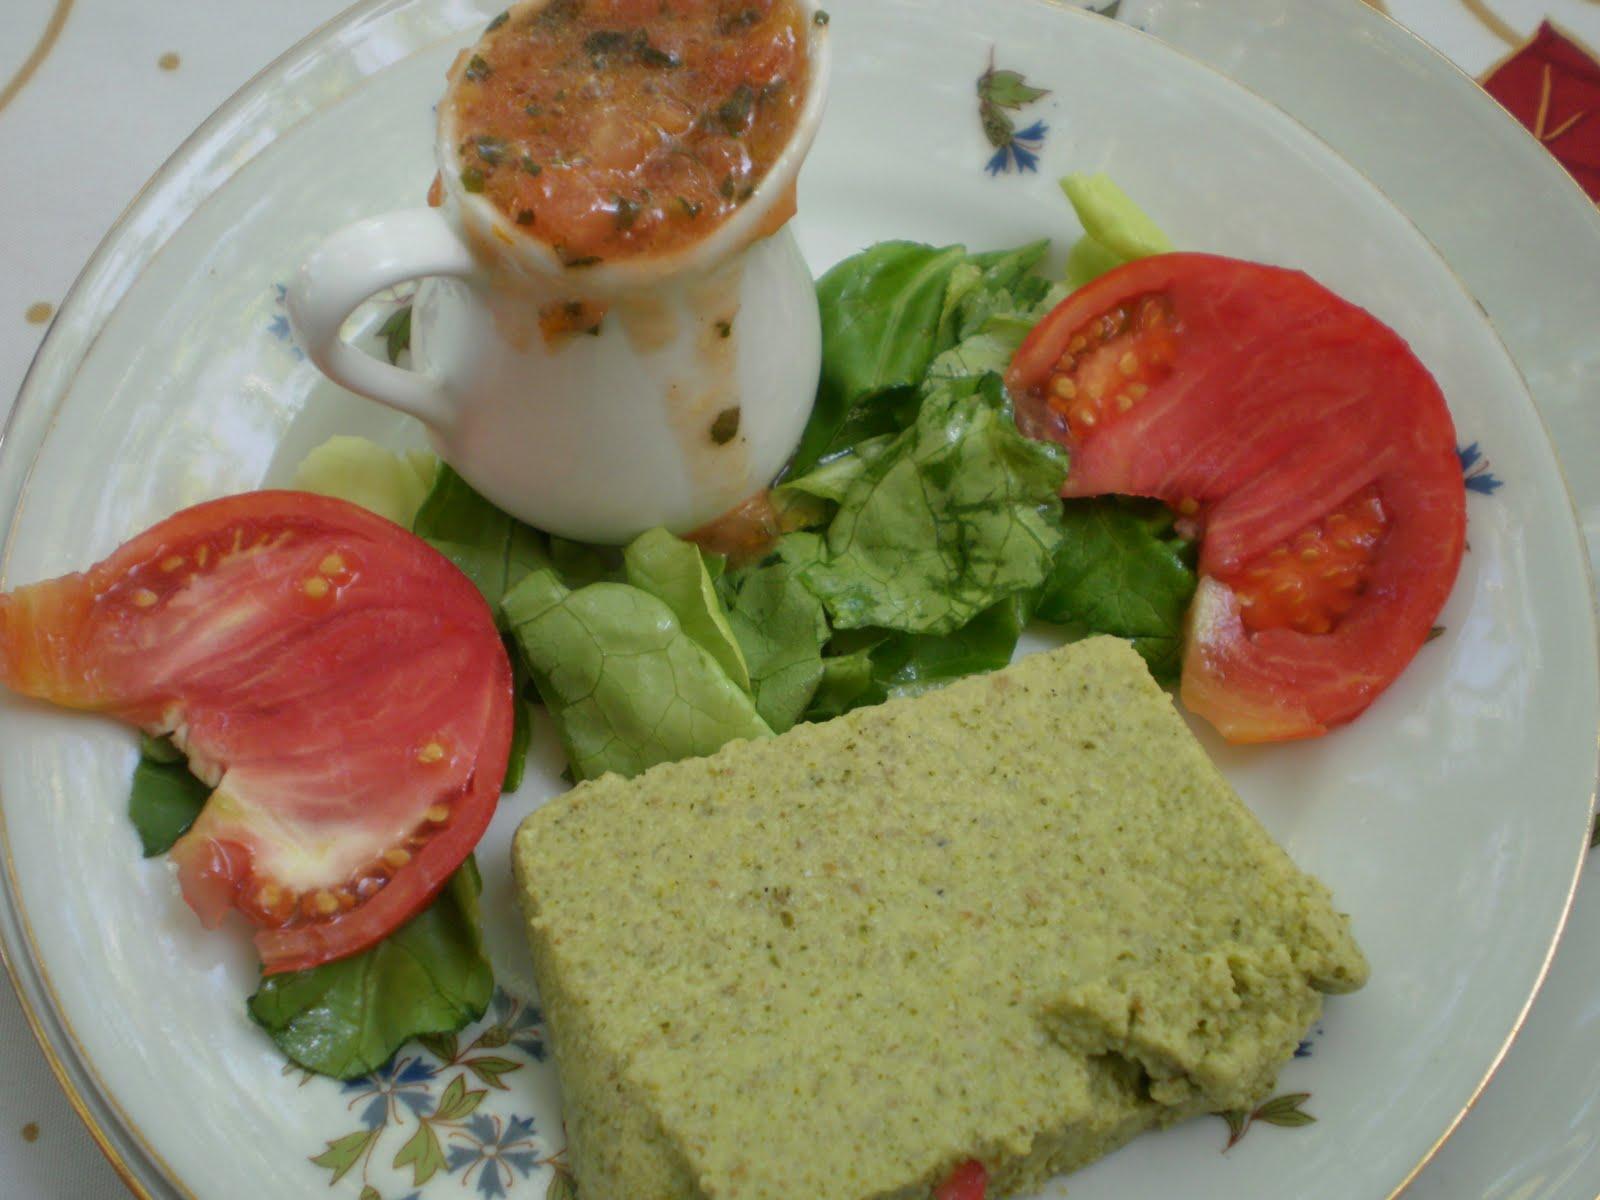 Terrine courgette basilic et tartare de tomates thermomix - Courgettes farcies thermomix ...